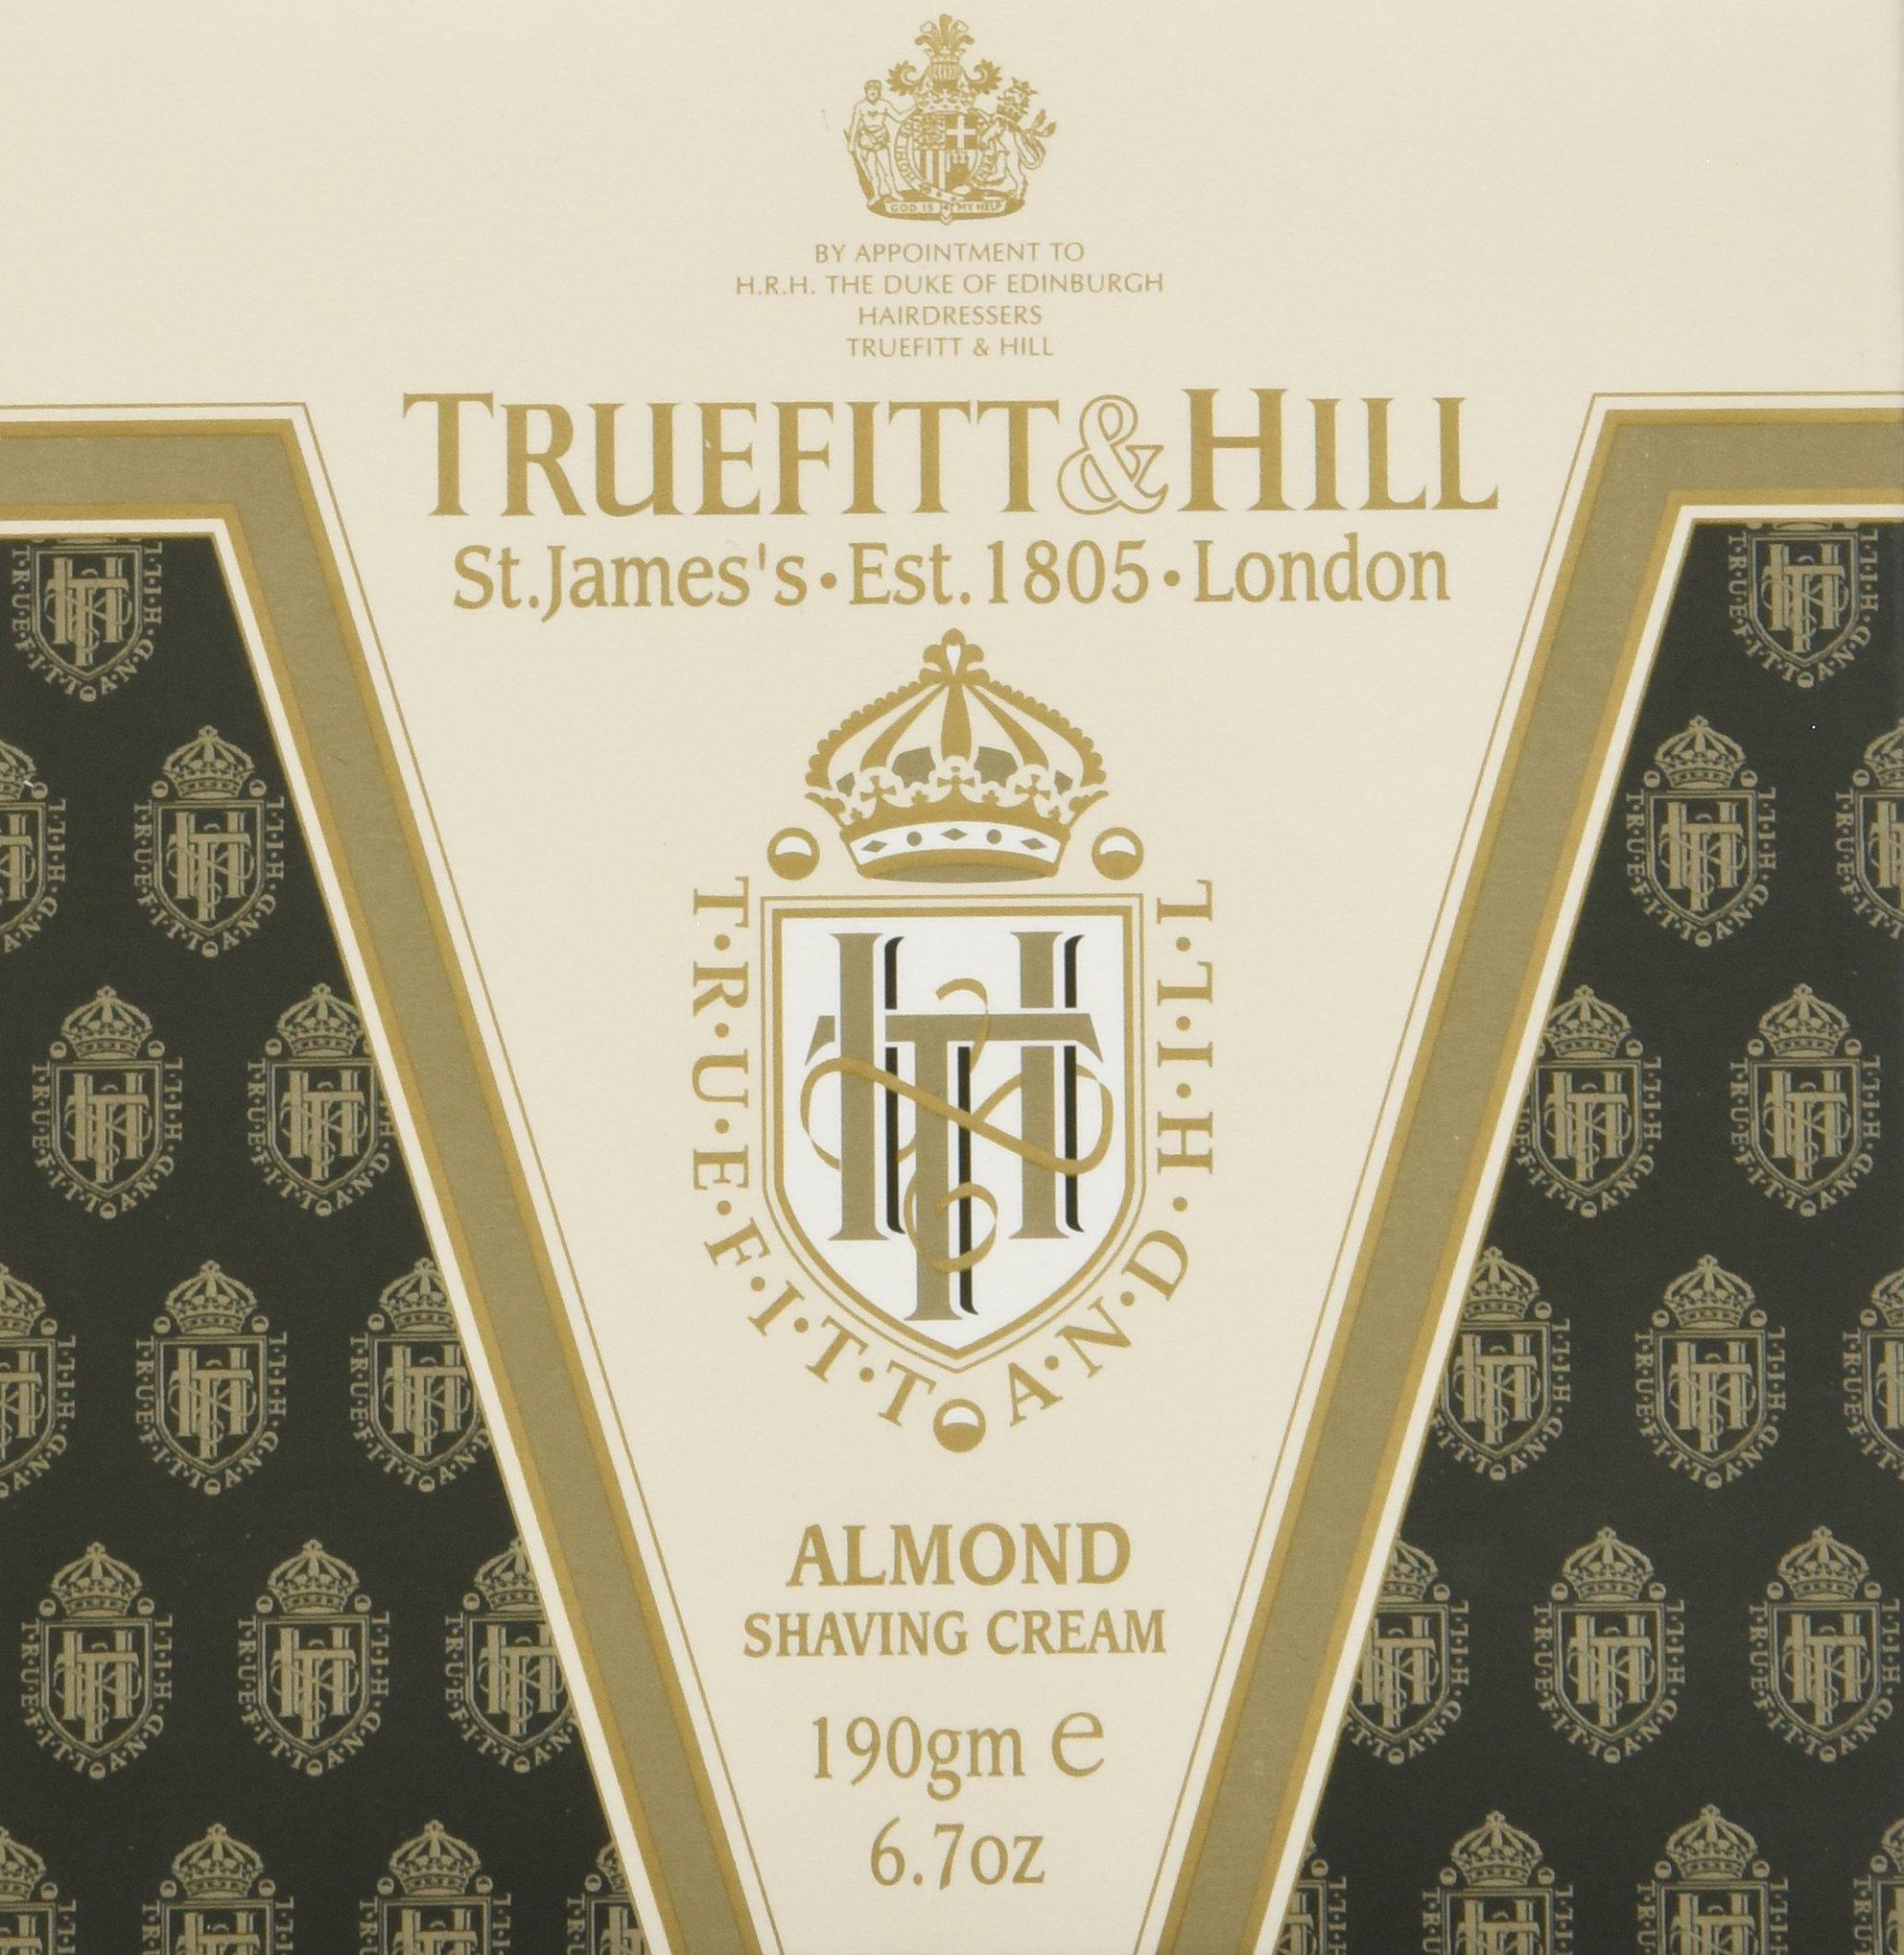 Truefitt & Hill Almond Shaving Cream Jar 6.7 ounces